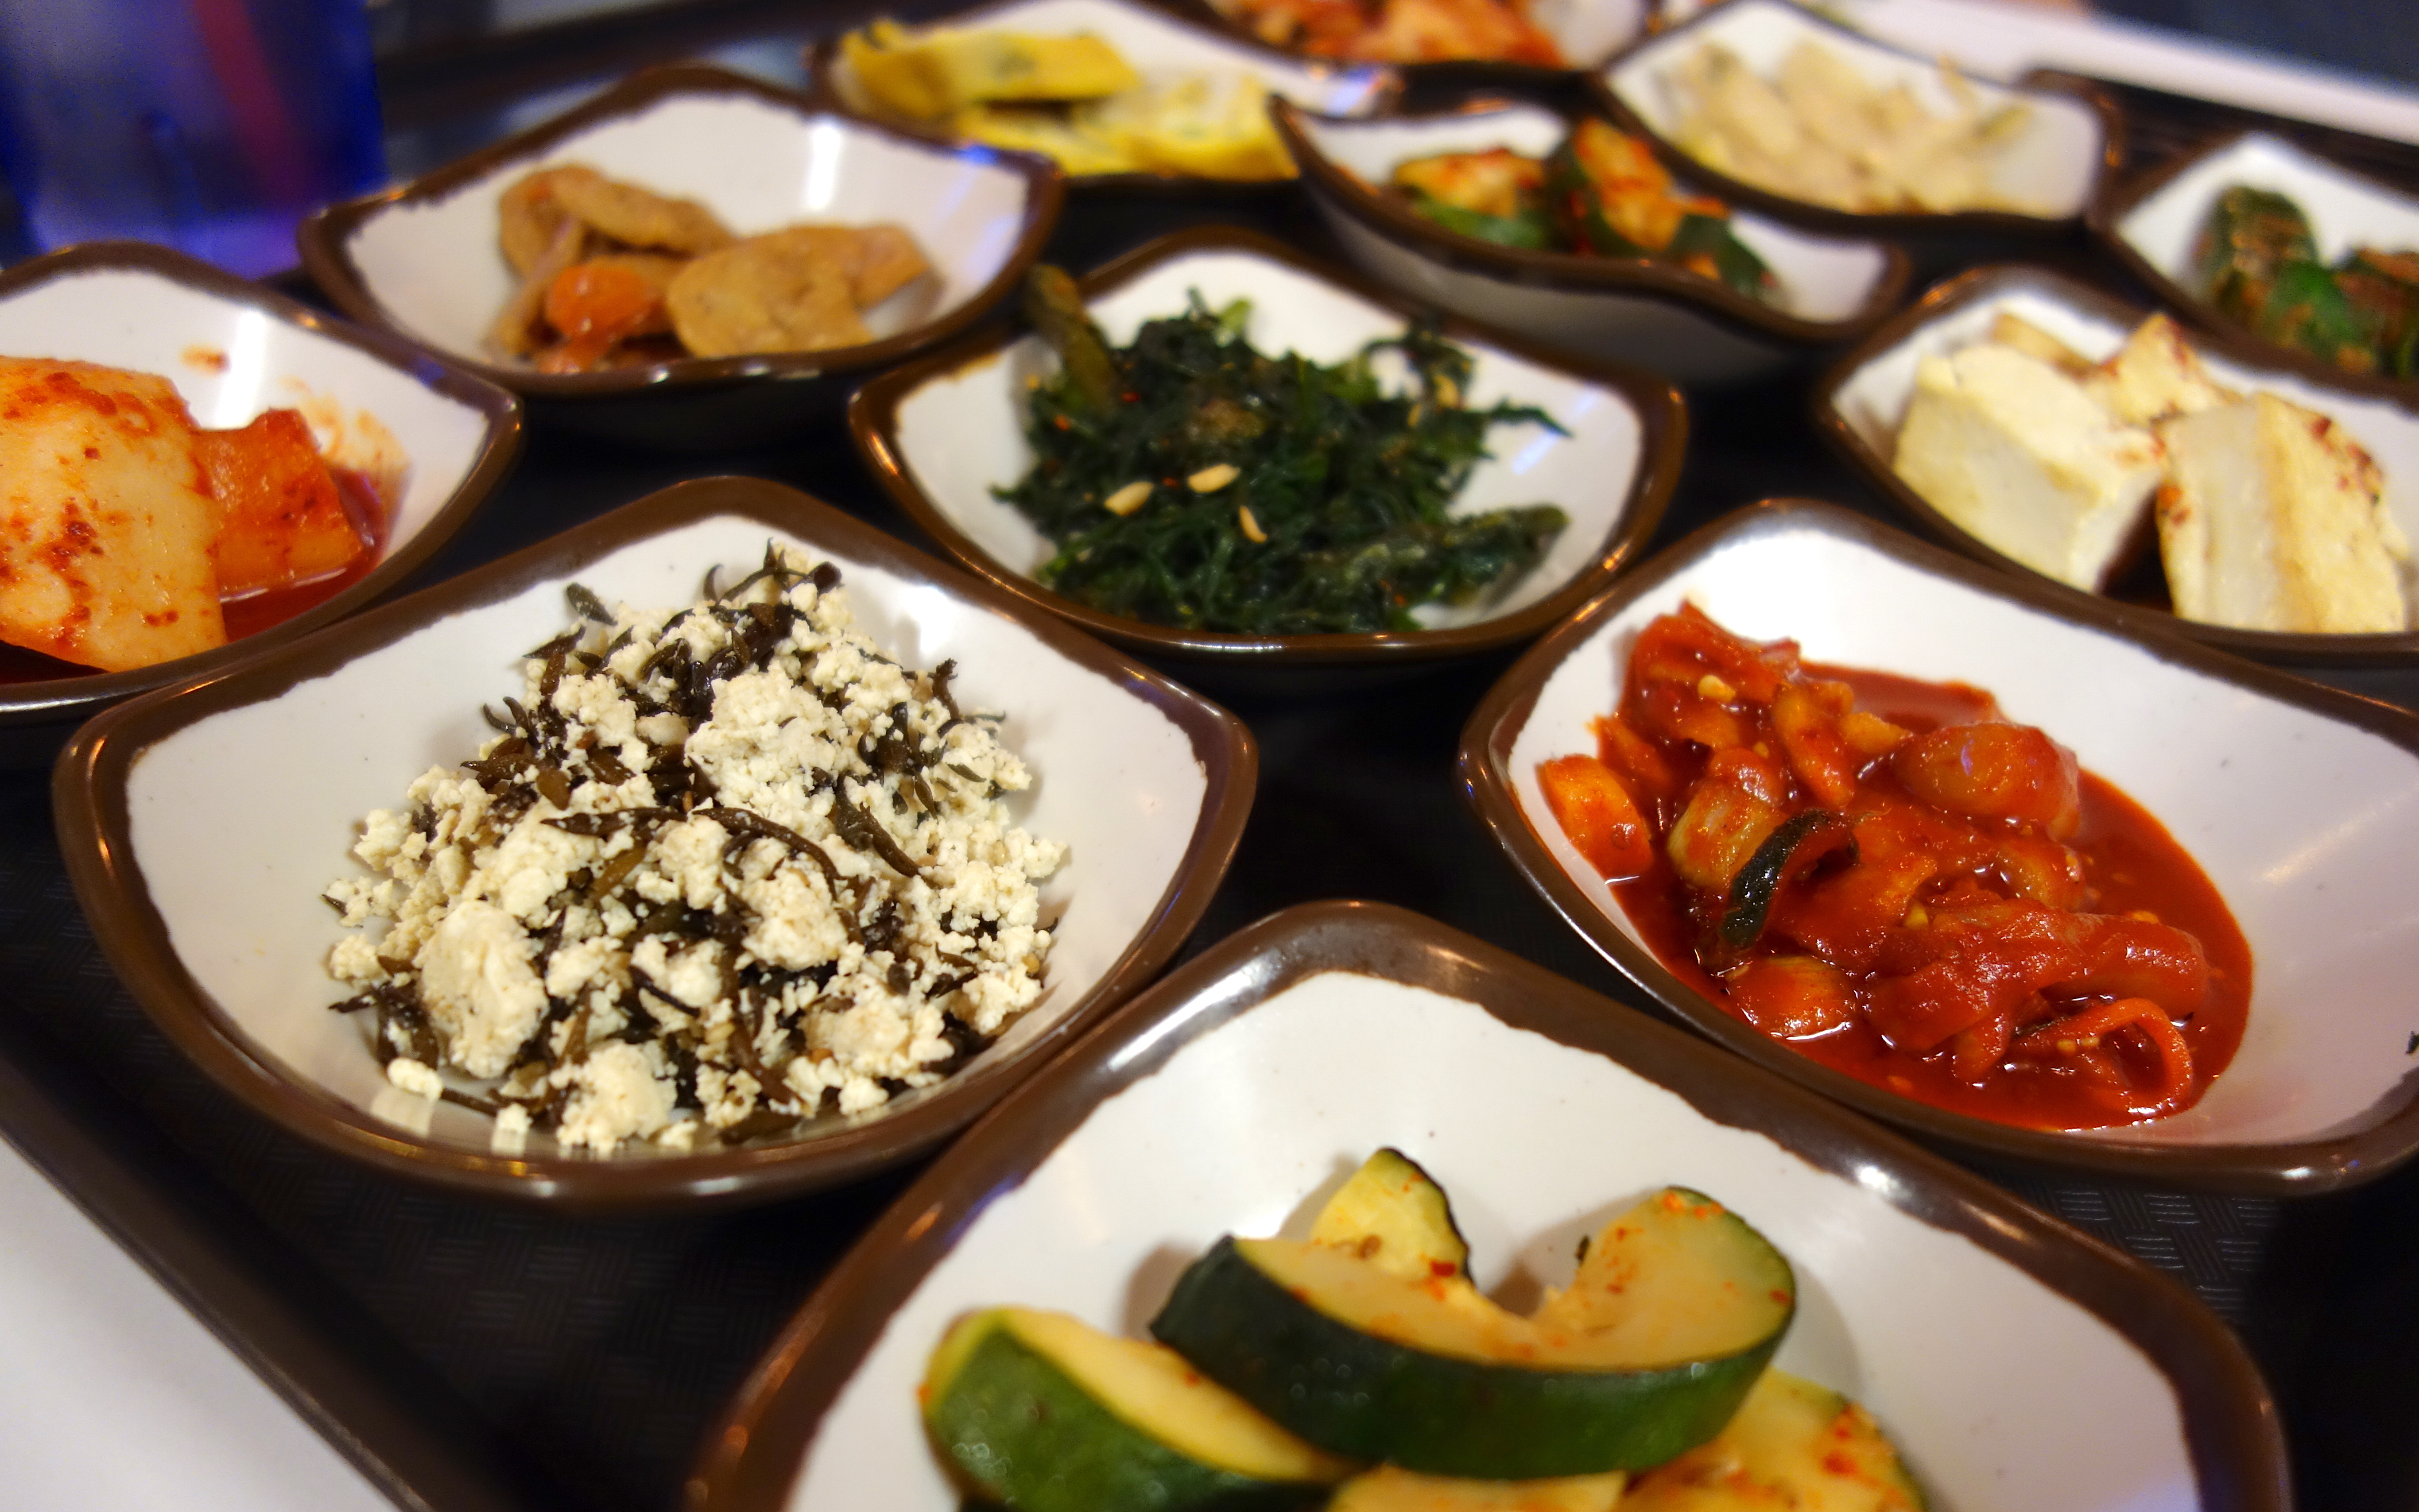 Where to Eat Korean Food in Aurora